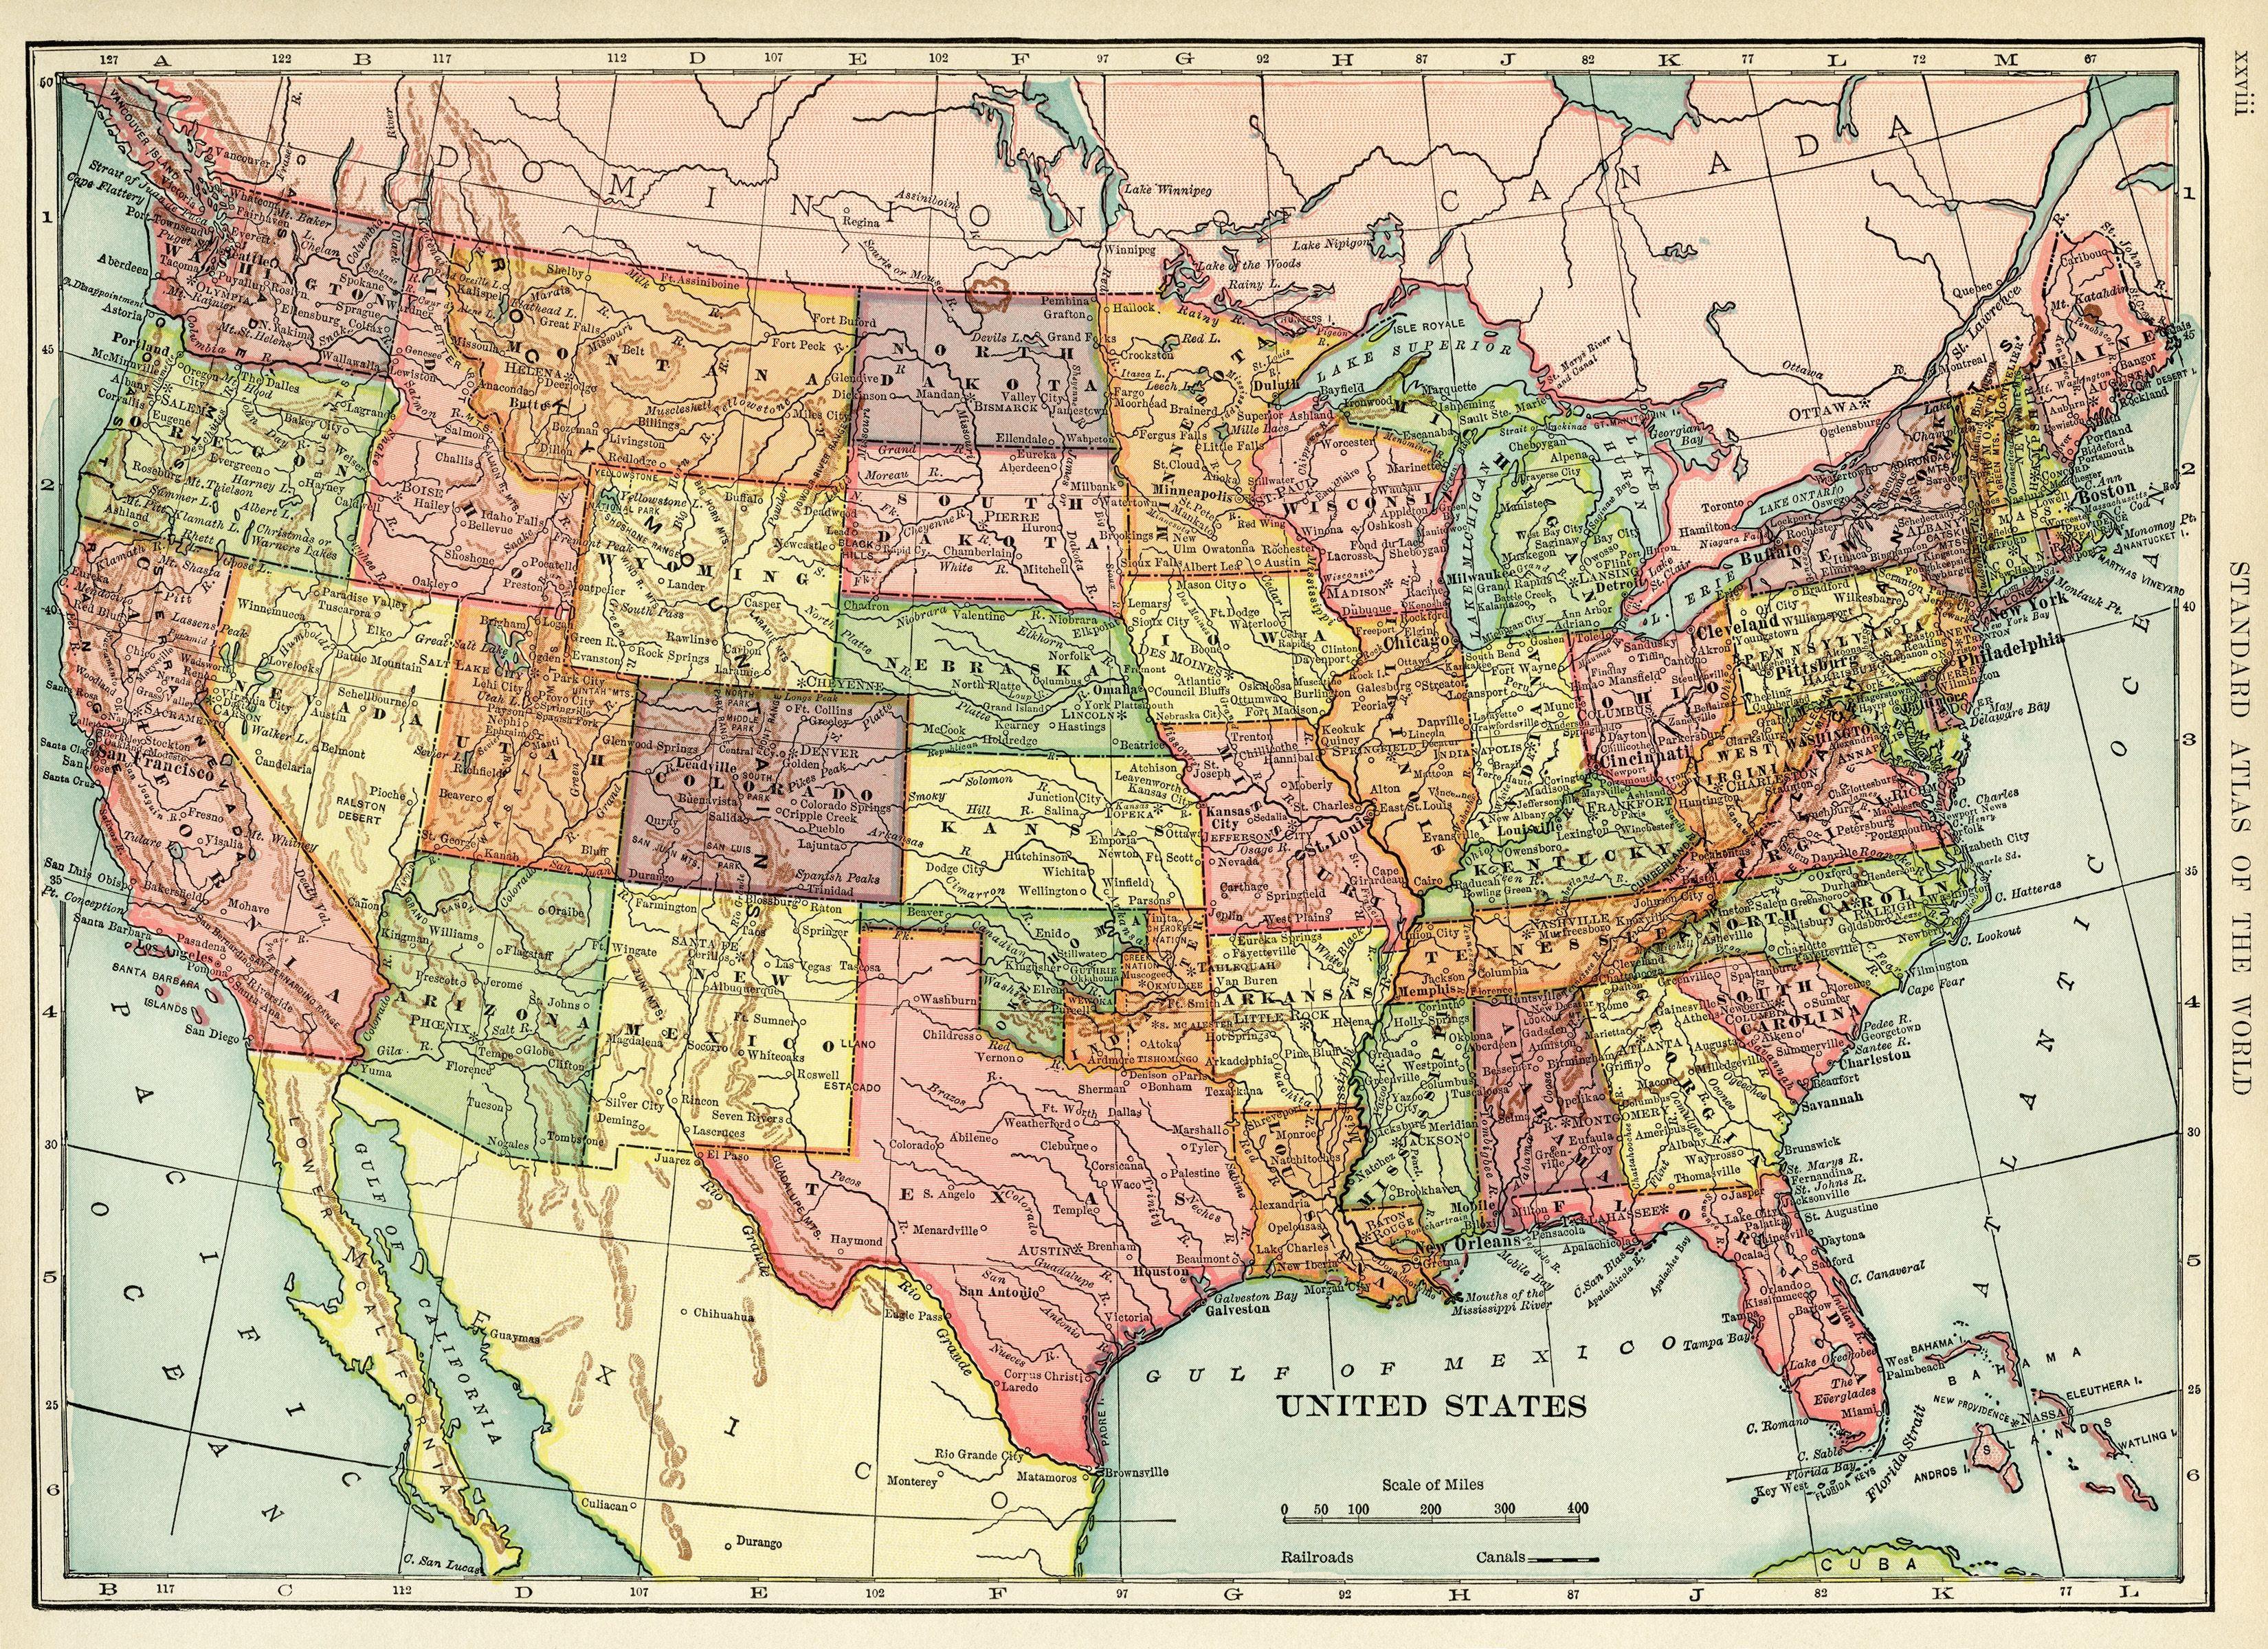 Us Atlas Road Map Download Best 10 Beautiful Free Printable Road Map - Printable Road Map Of Colorado